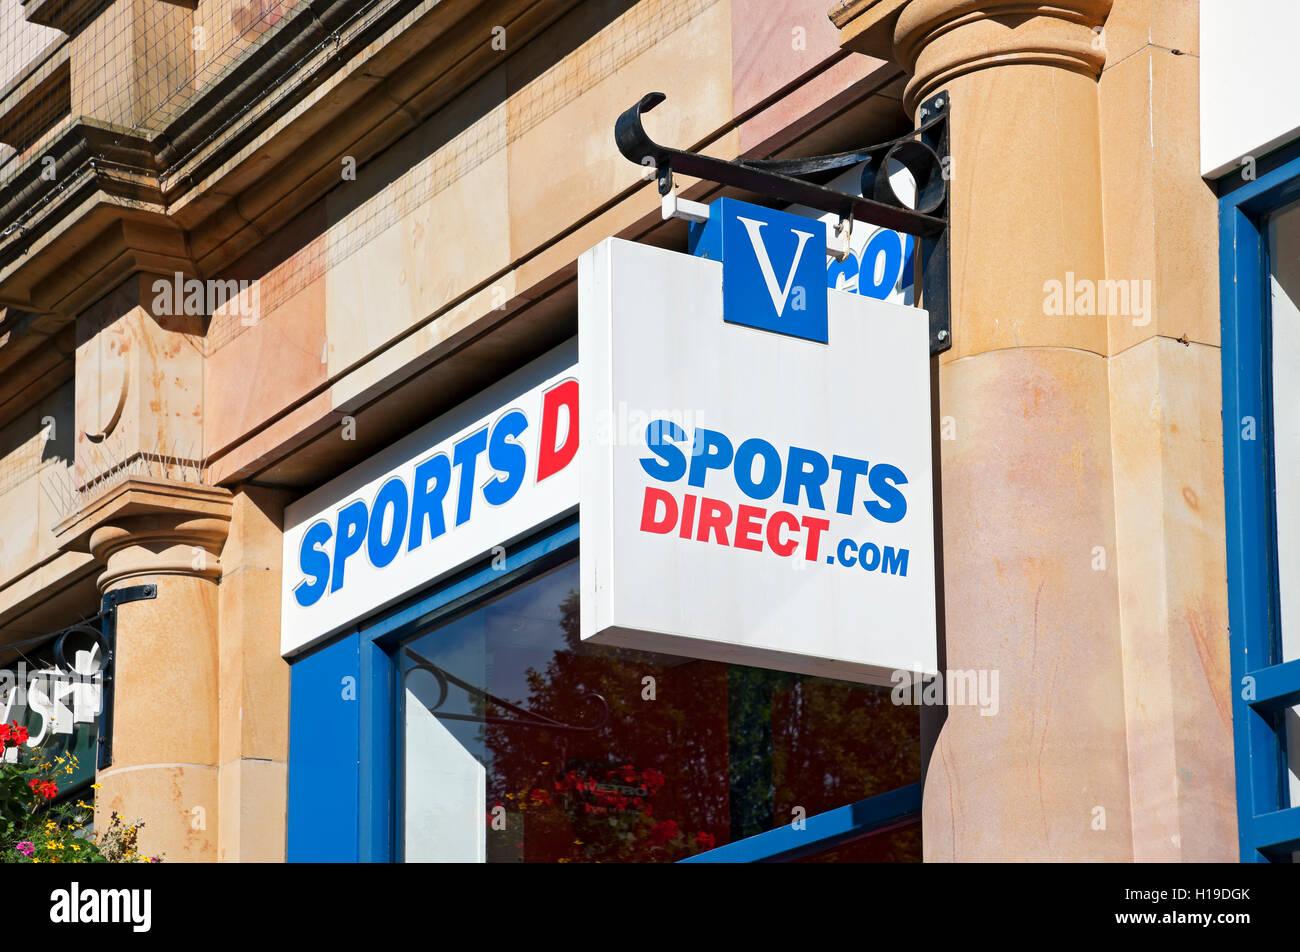 c99e469d95 Sports Direct sign Harrogate North Yorkshire England UK United Kingdom GB  Great Britain - Stock Image